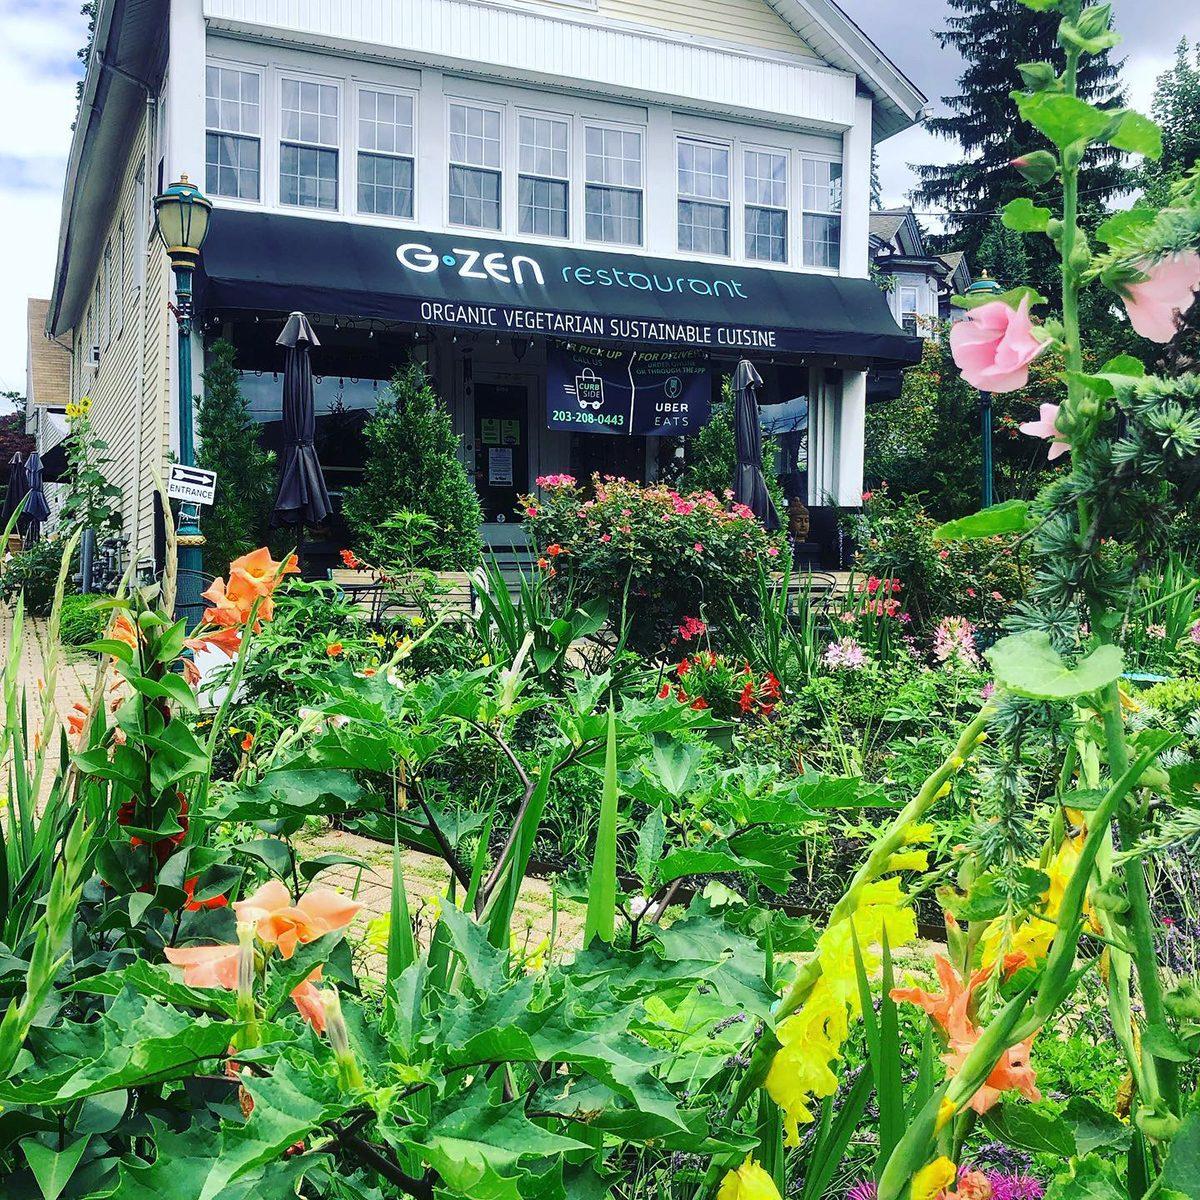 Best vegetarian and vegan restaurant in Connecticut G-Zen Restaurant